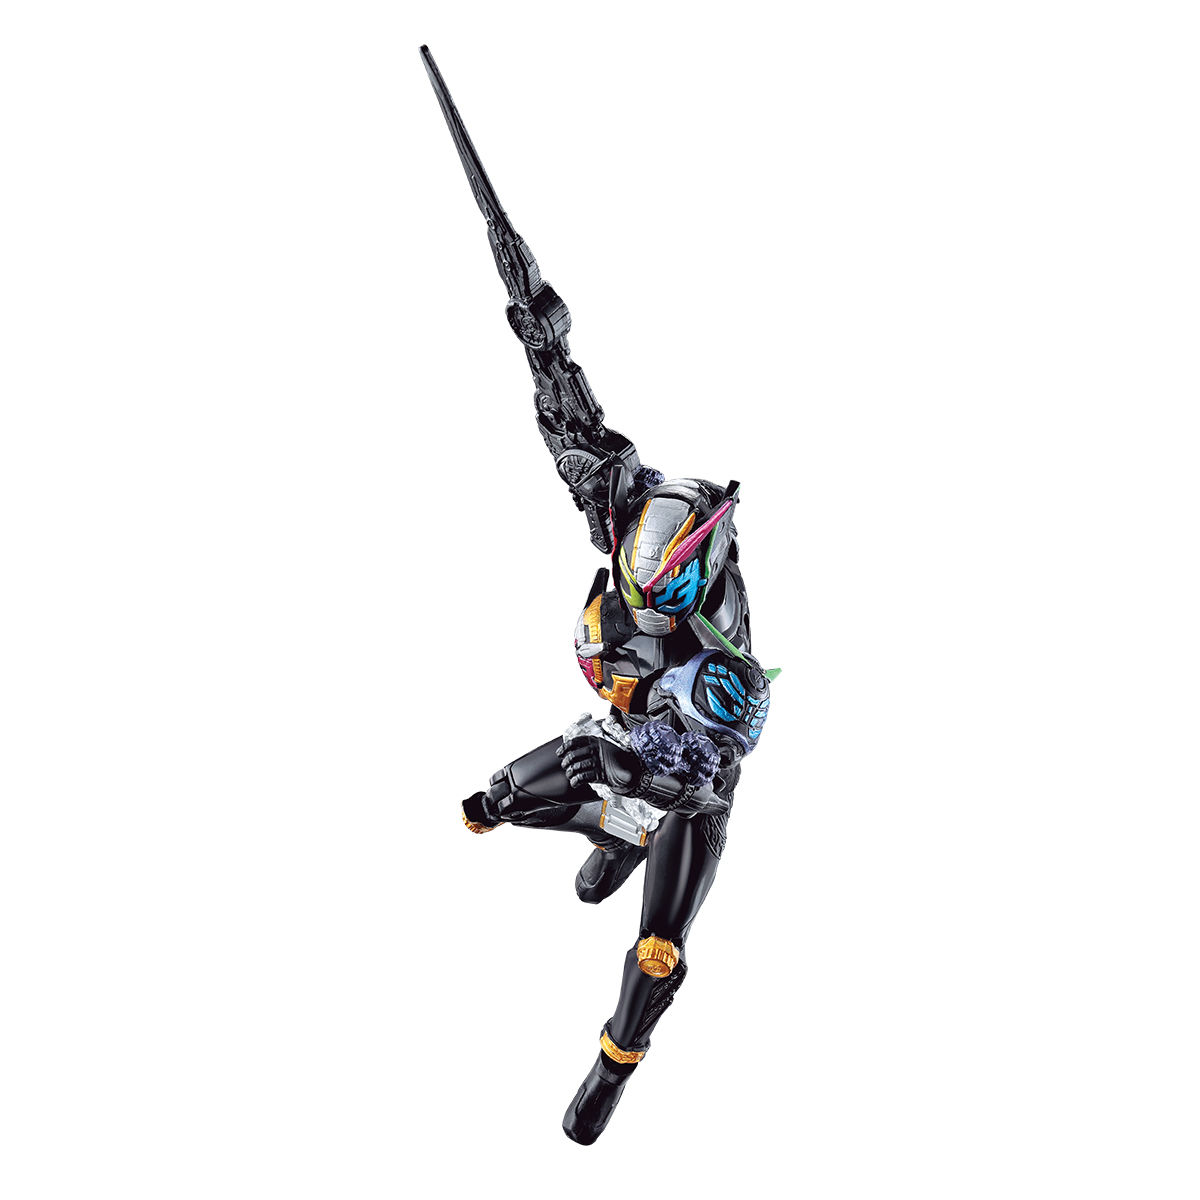 RKFライダーアーマーシリーズ『仮面ライダージオウトリニティ』可動フィギュア-002